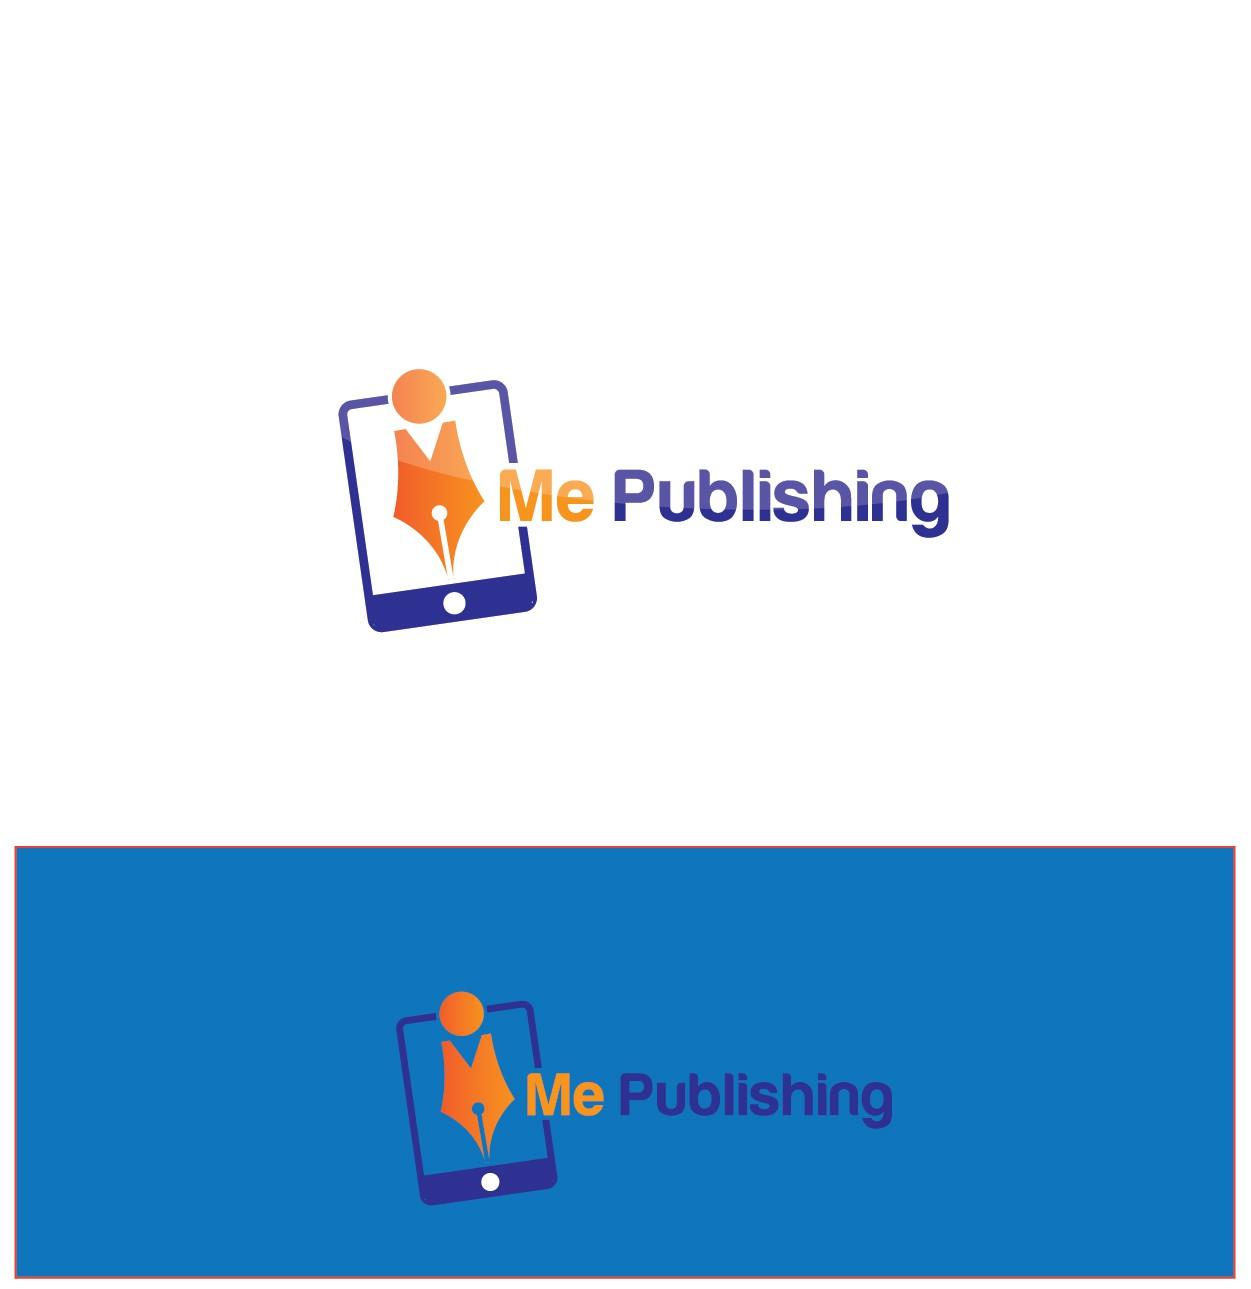 logo for Me Publishing